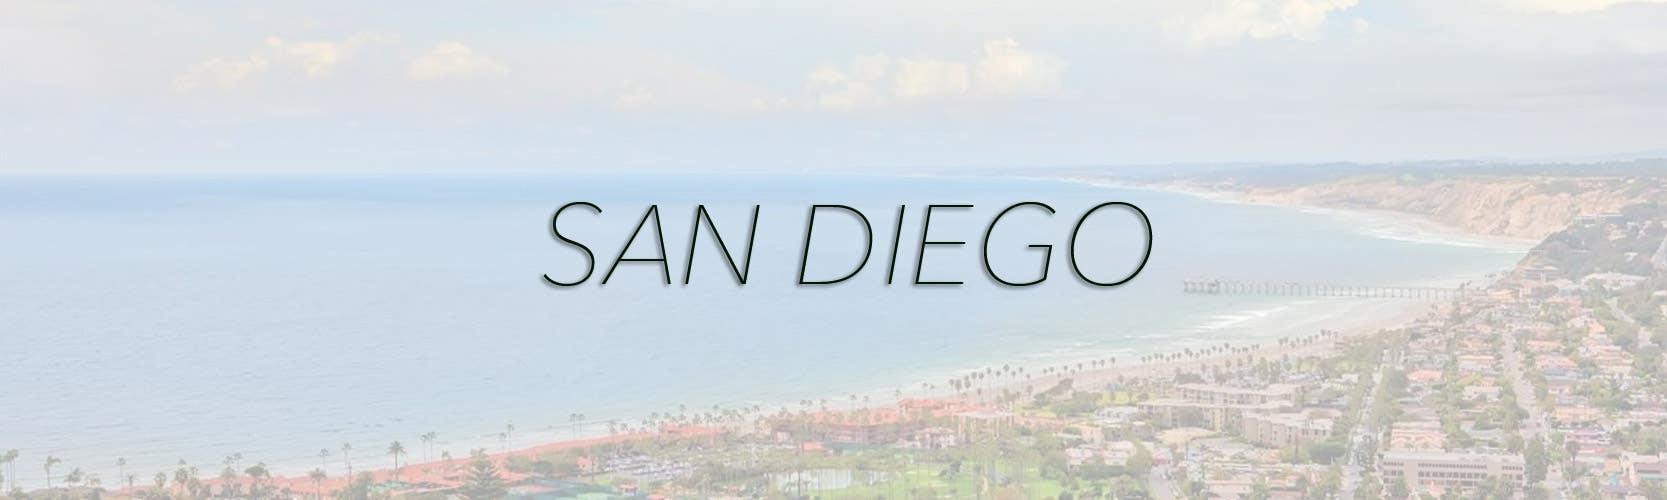 Crib for sale san diego - The Futon Shop San Diego